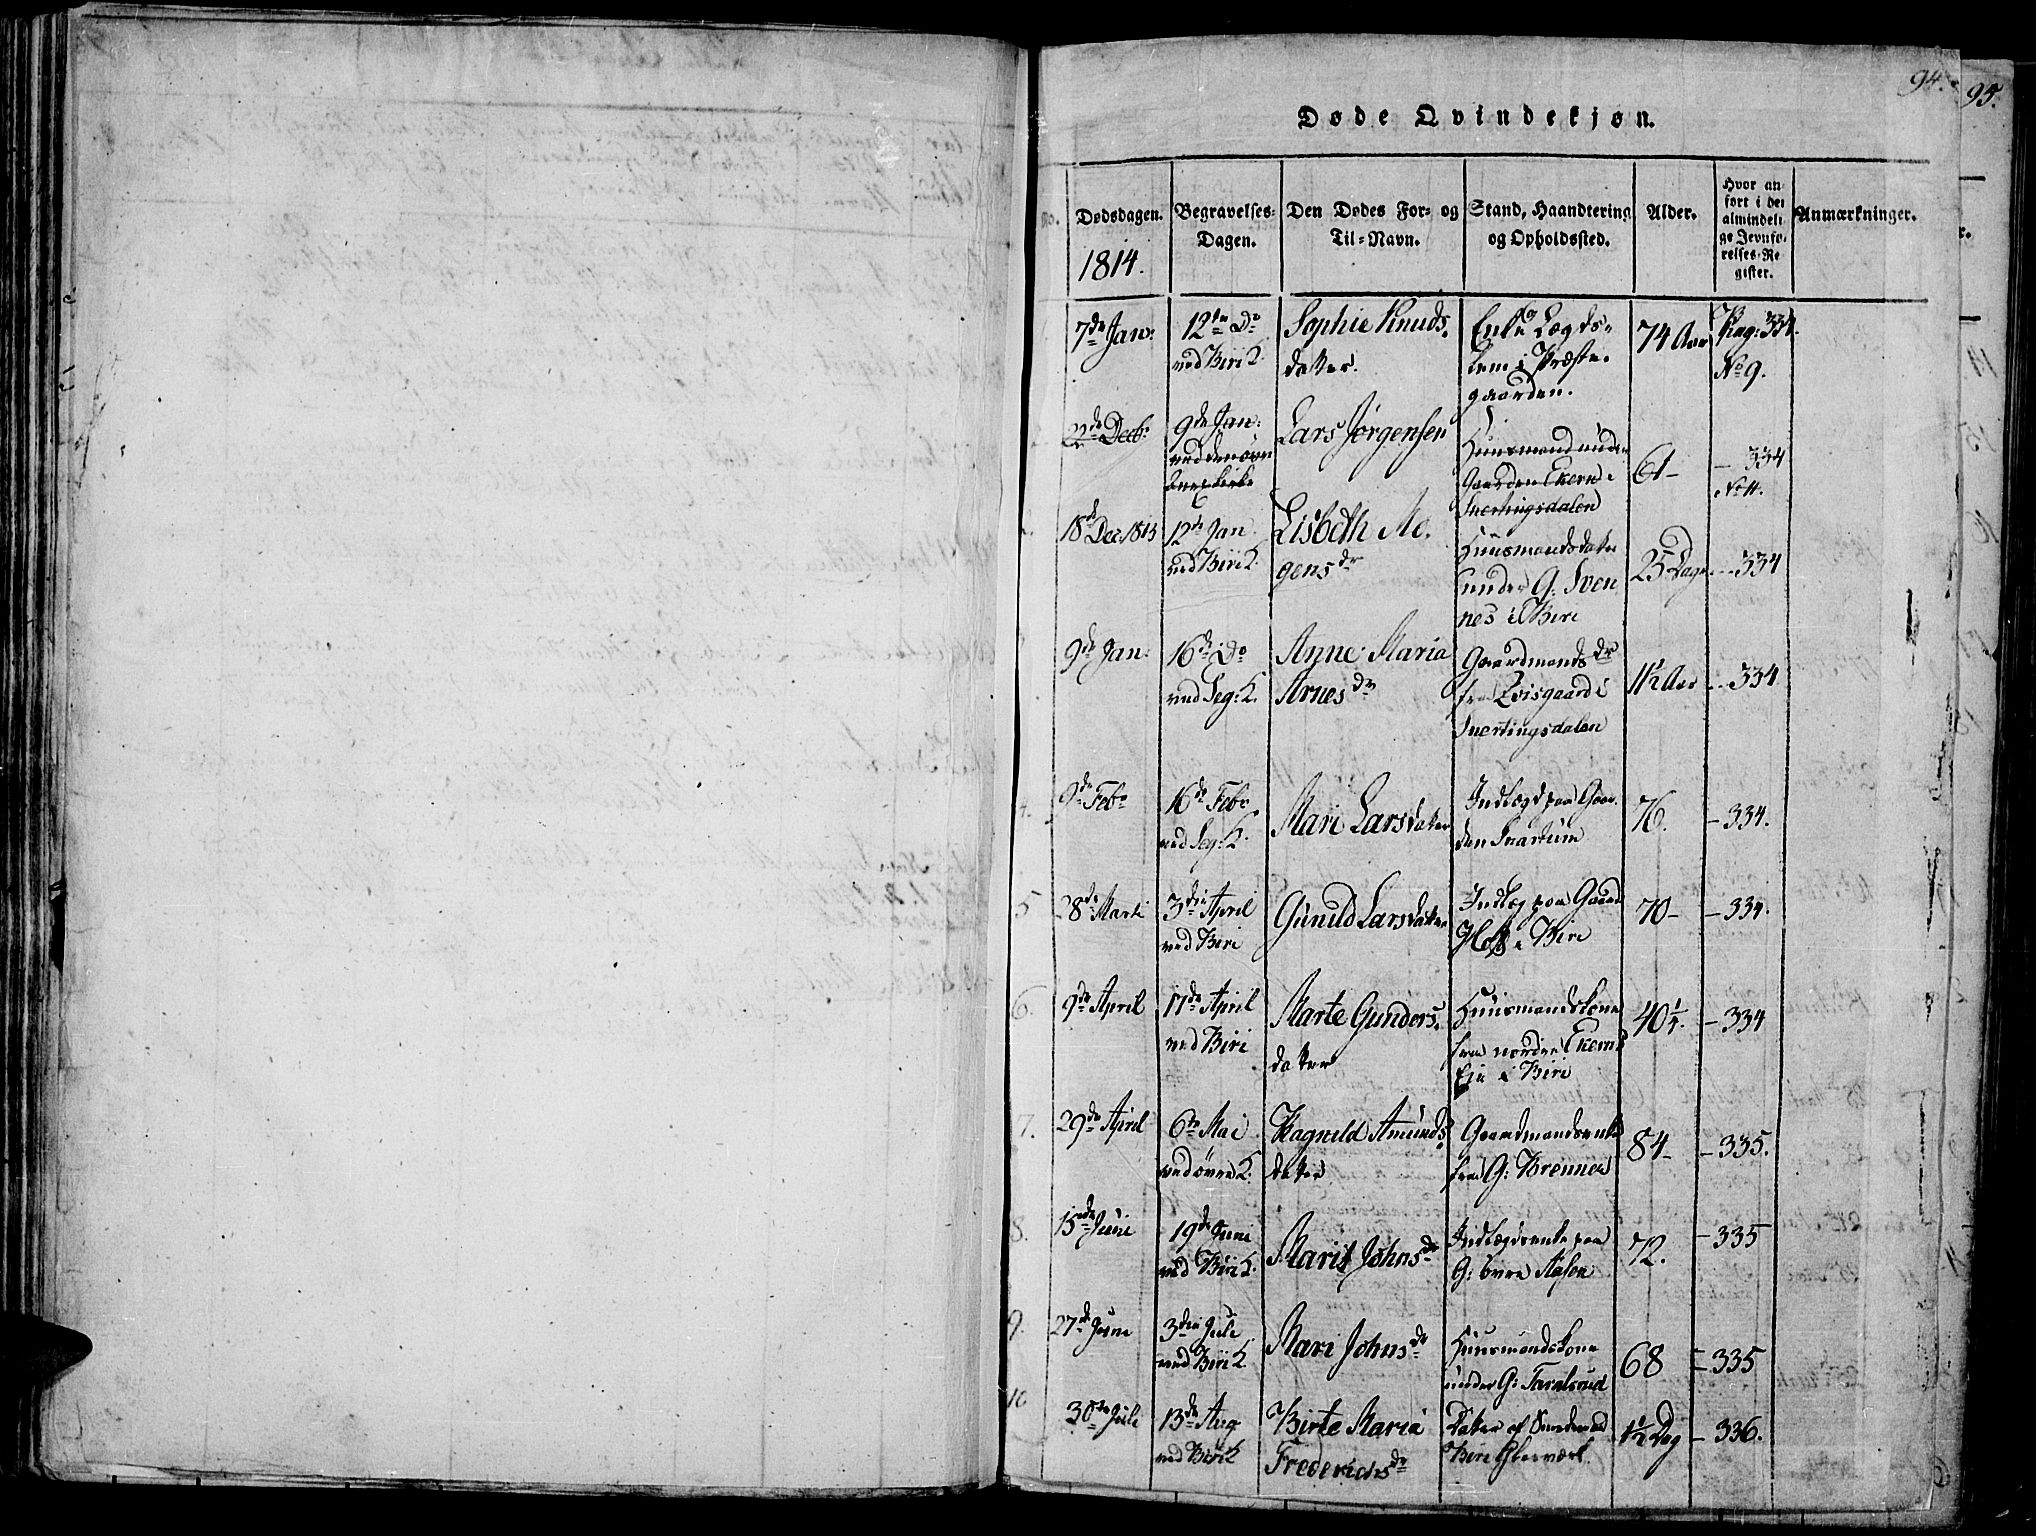 SAH, Biri prestekontor, Ministerialbok nr. 3, 1814-1828, s. 94